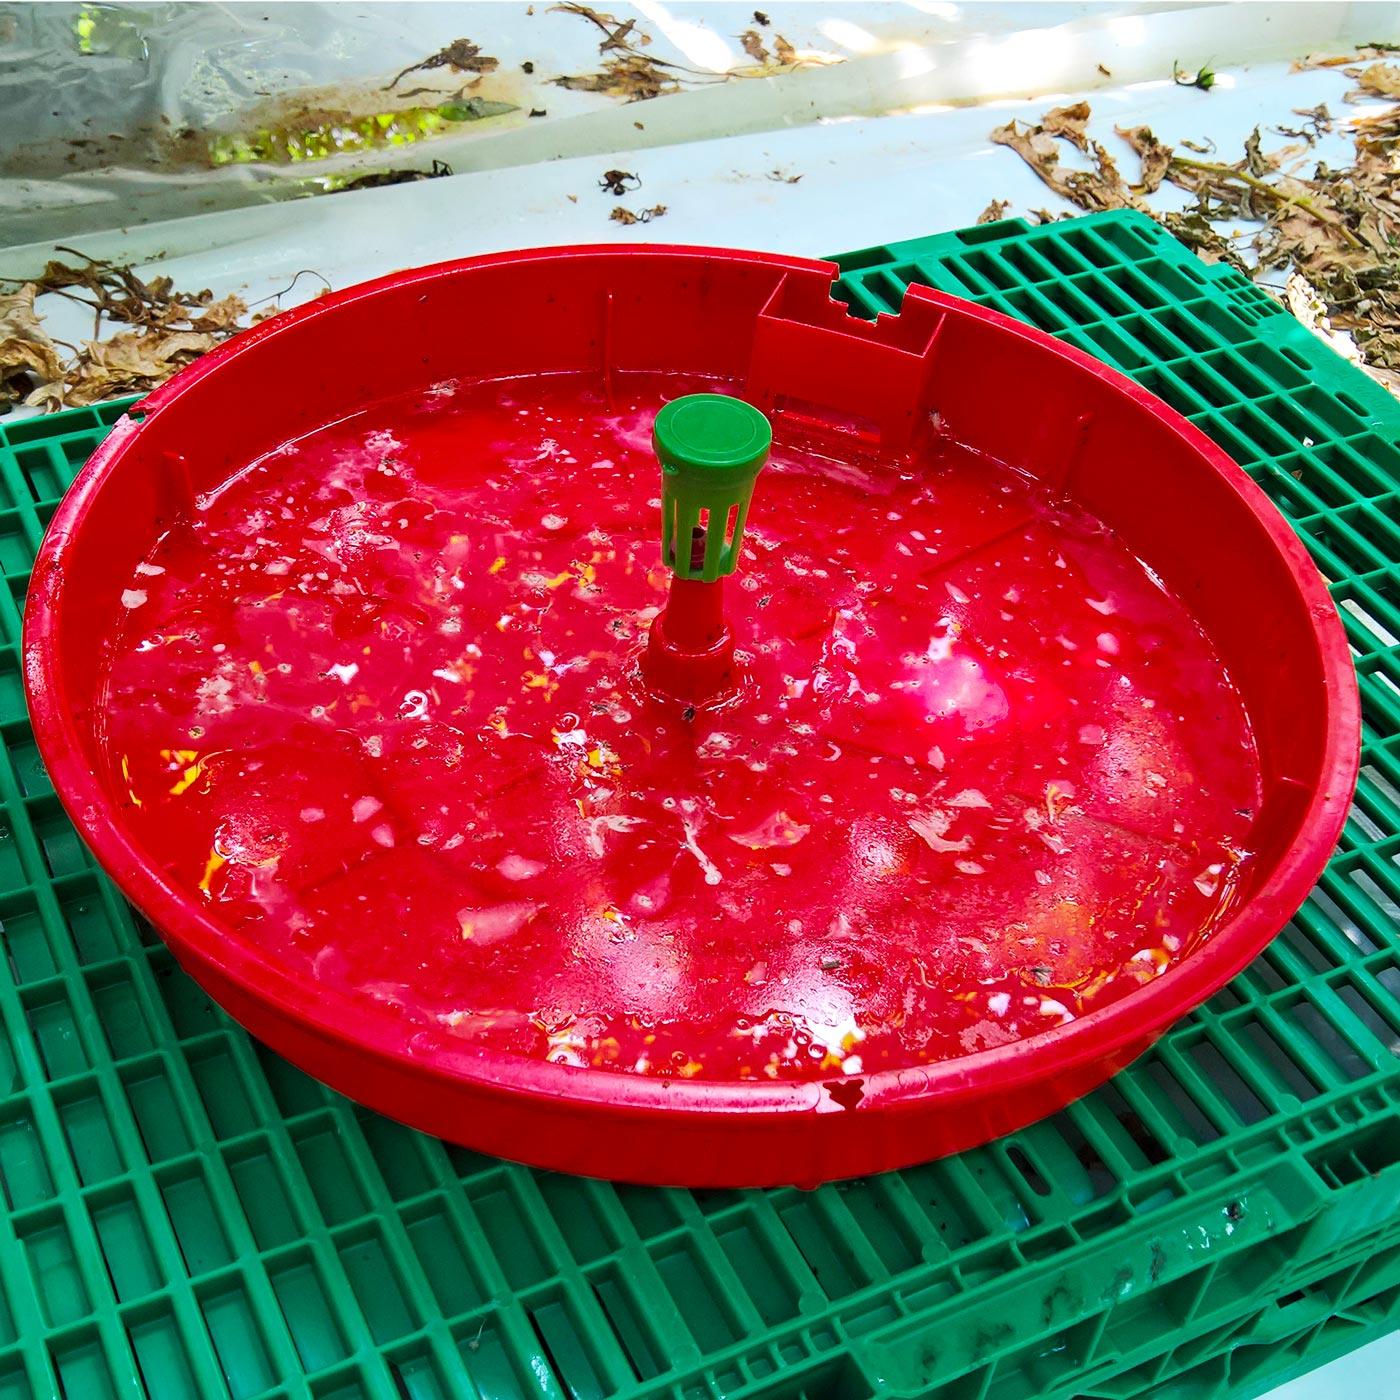 Piéger la mineuse de la tomate